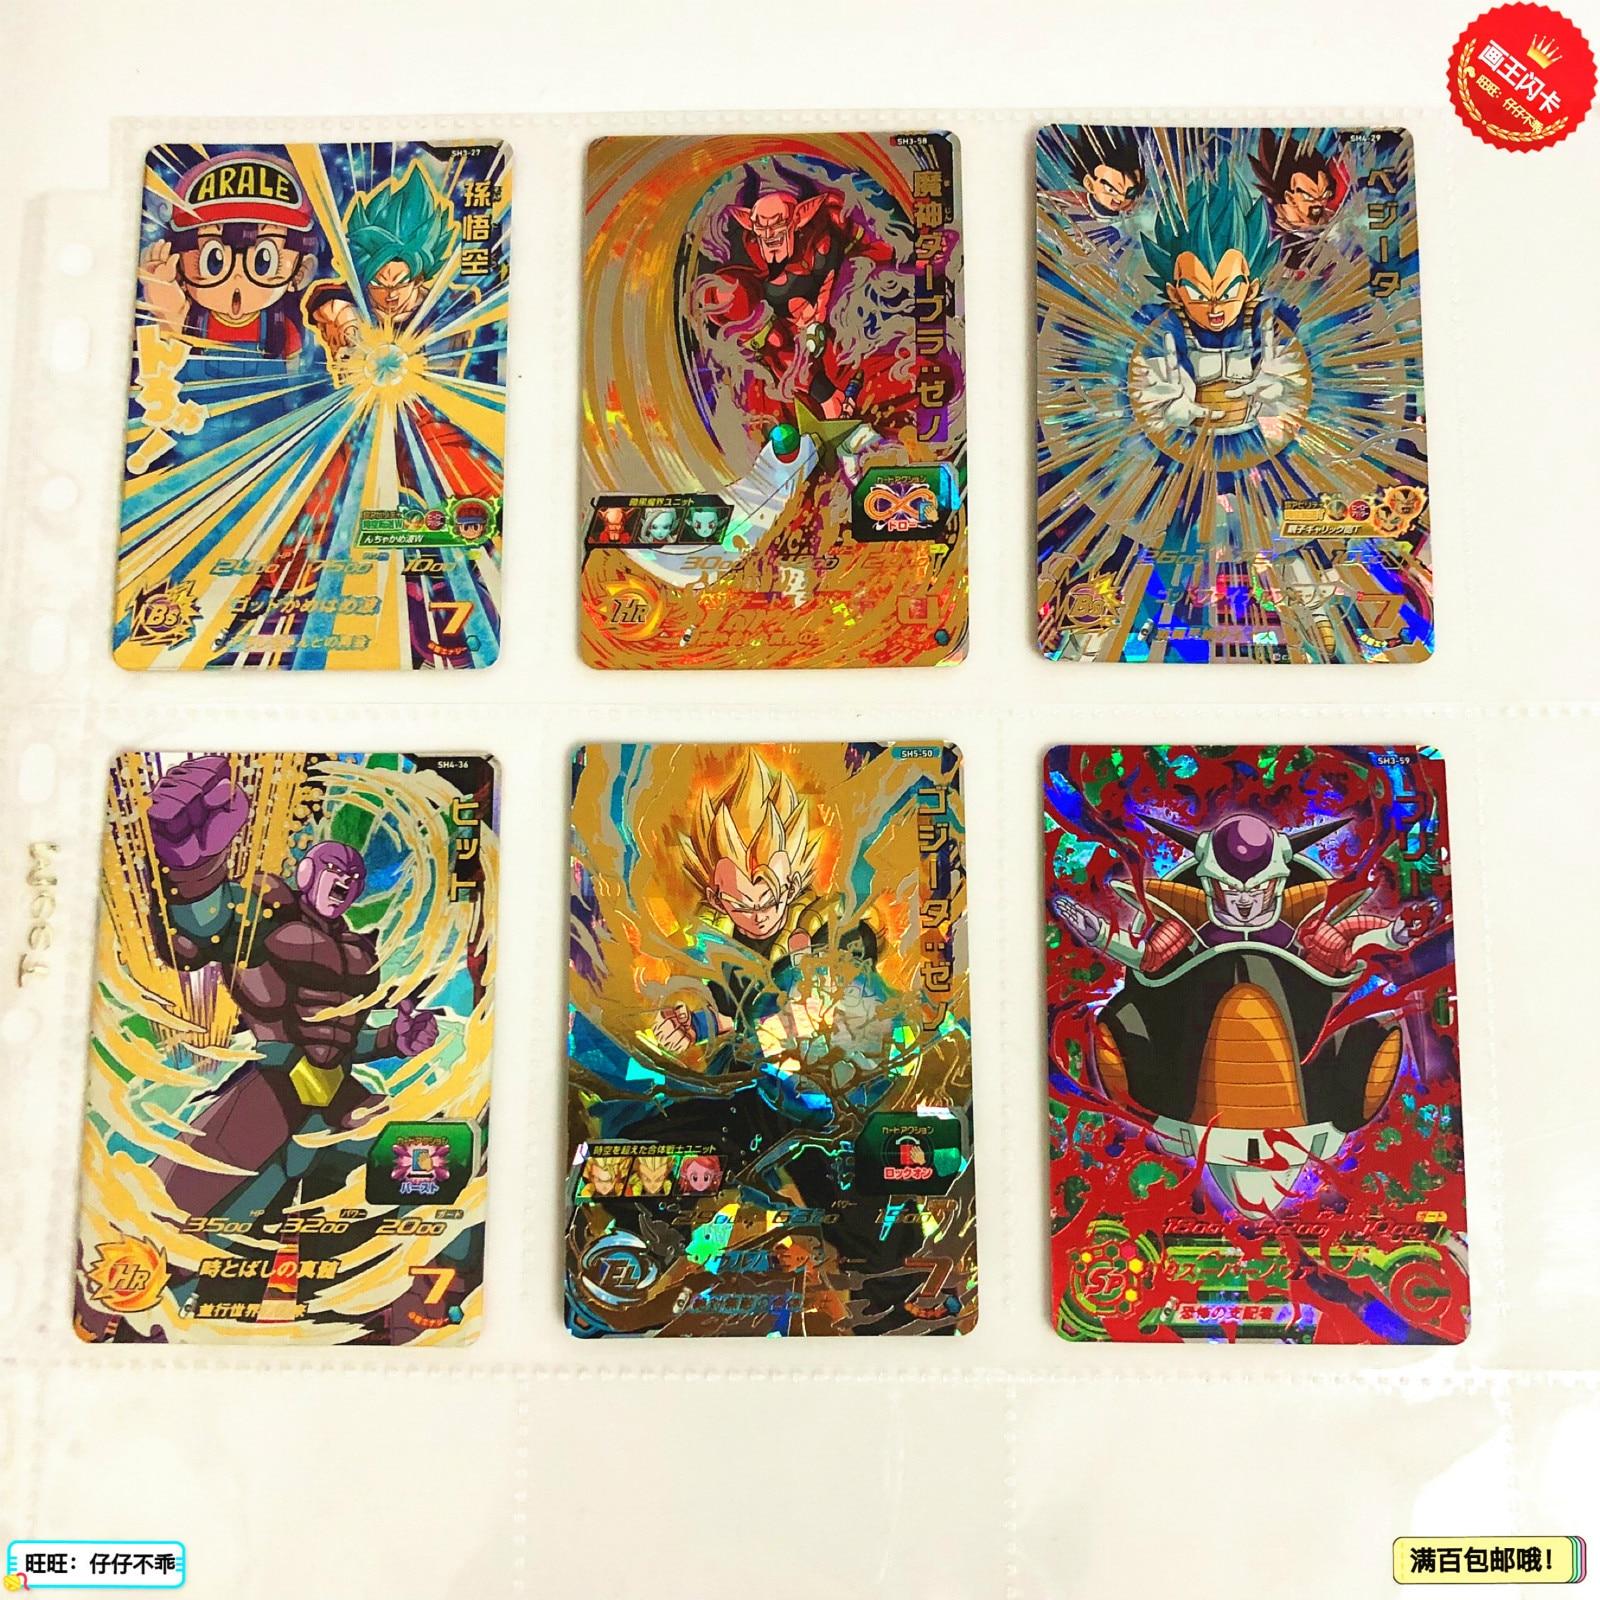 Japan Original Dragon Ball Hero Card SH 4 Stars UR Goku Toys Hobbies Collectibles Game Collection Anime Cards